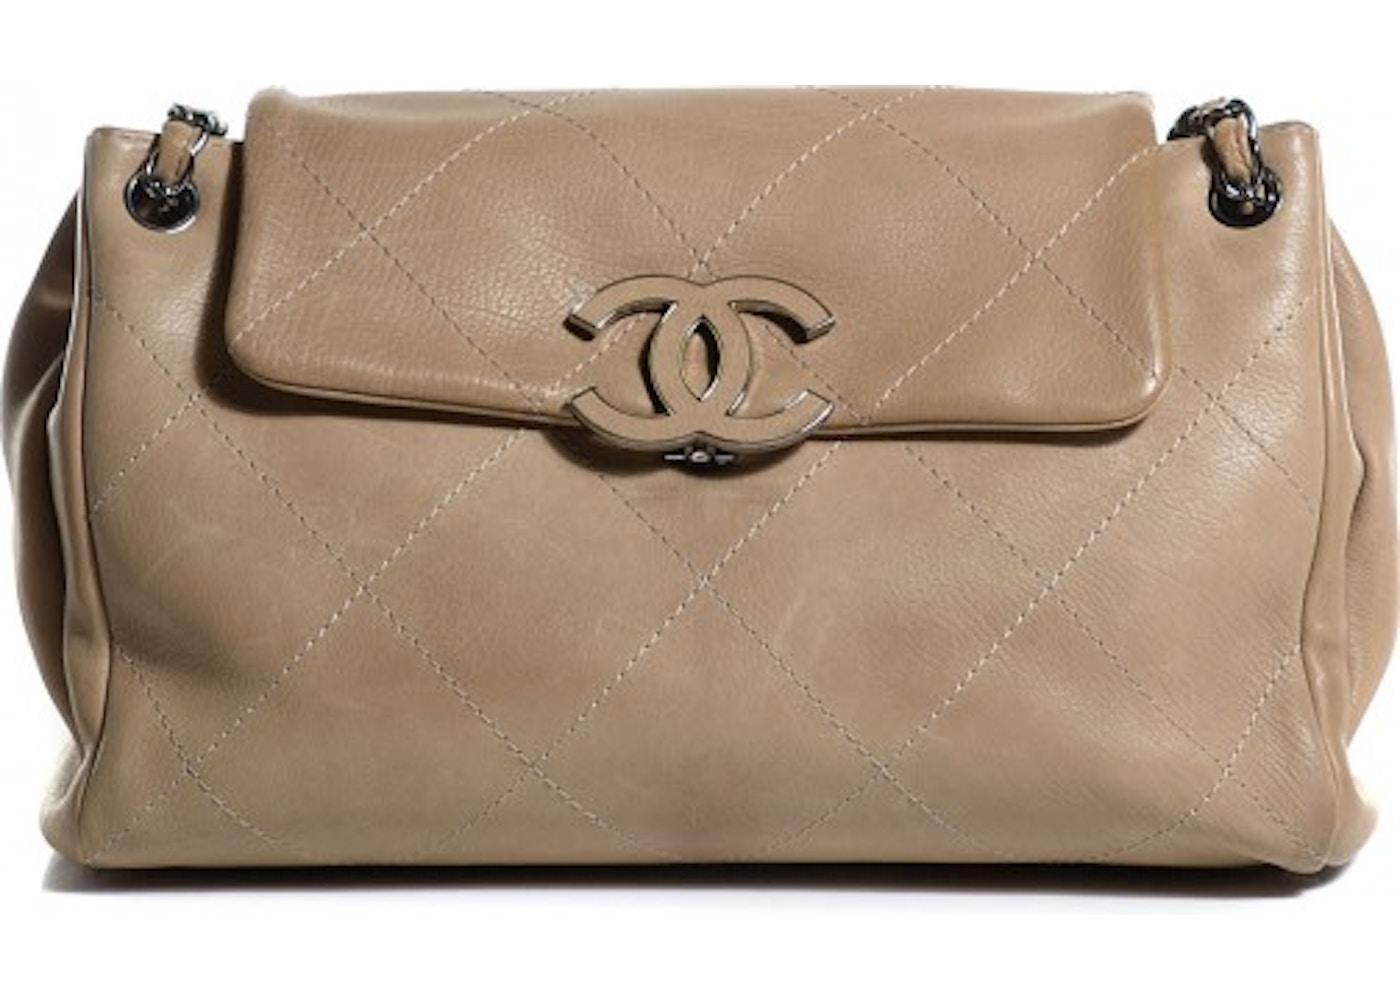 abb38f7e971423 Chanel Shoulder Flap Hampton Quilted Large Beige